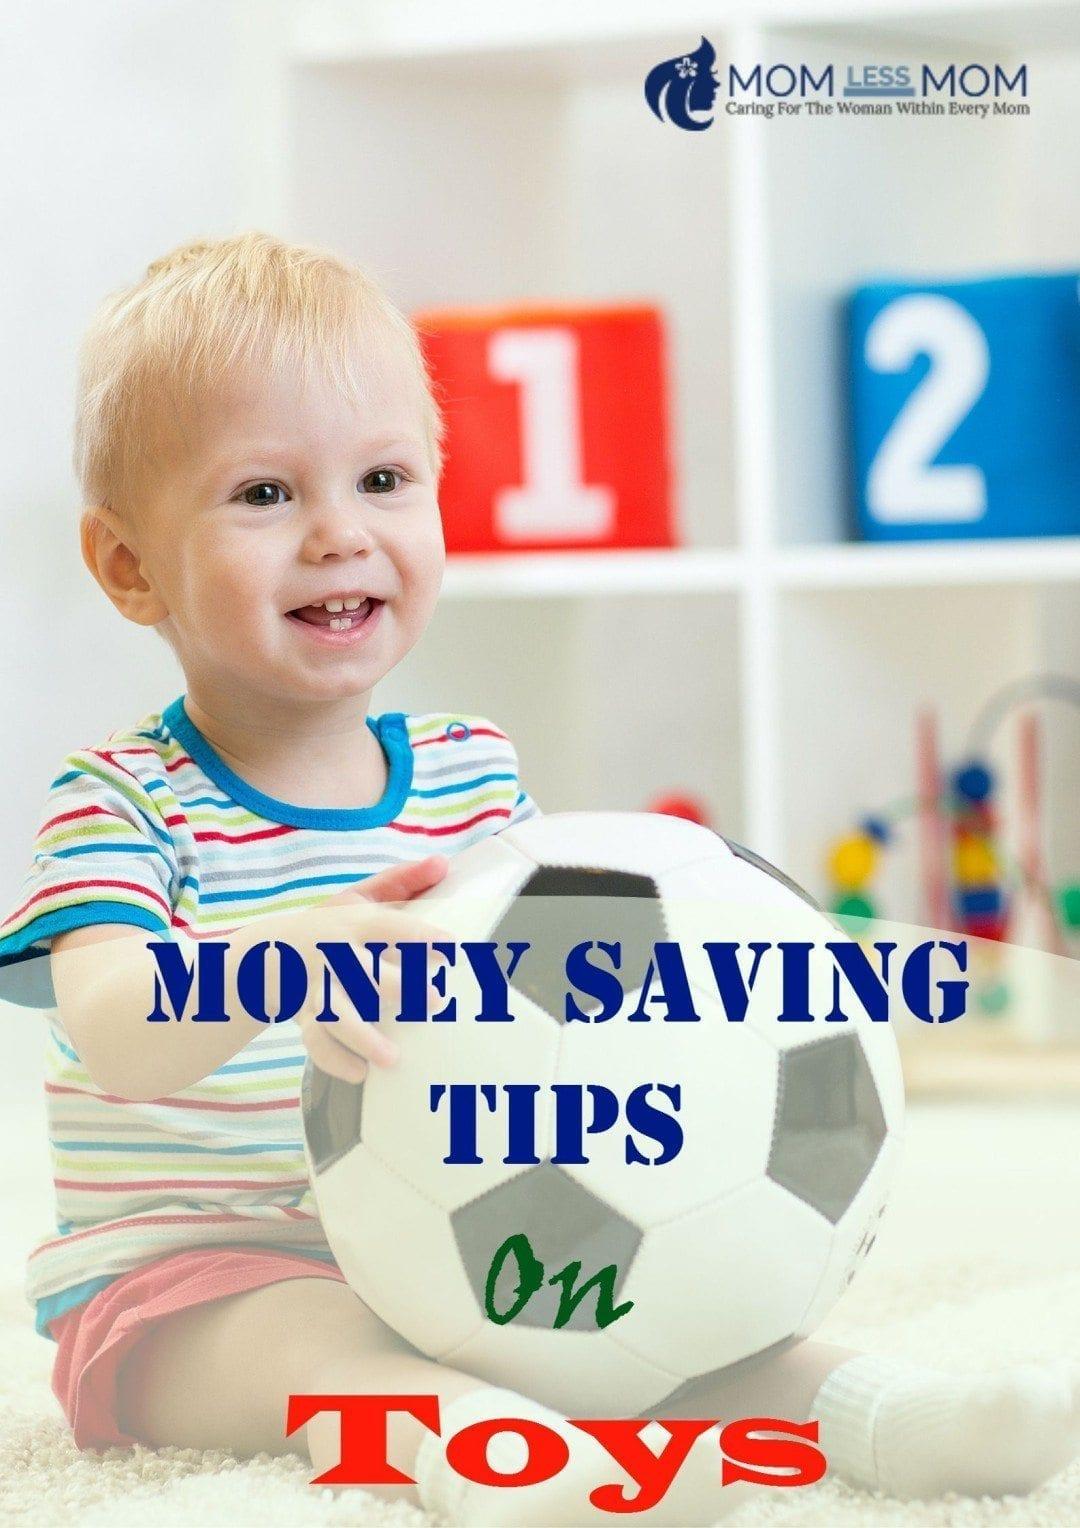 Money Saving Tips for Toys